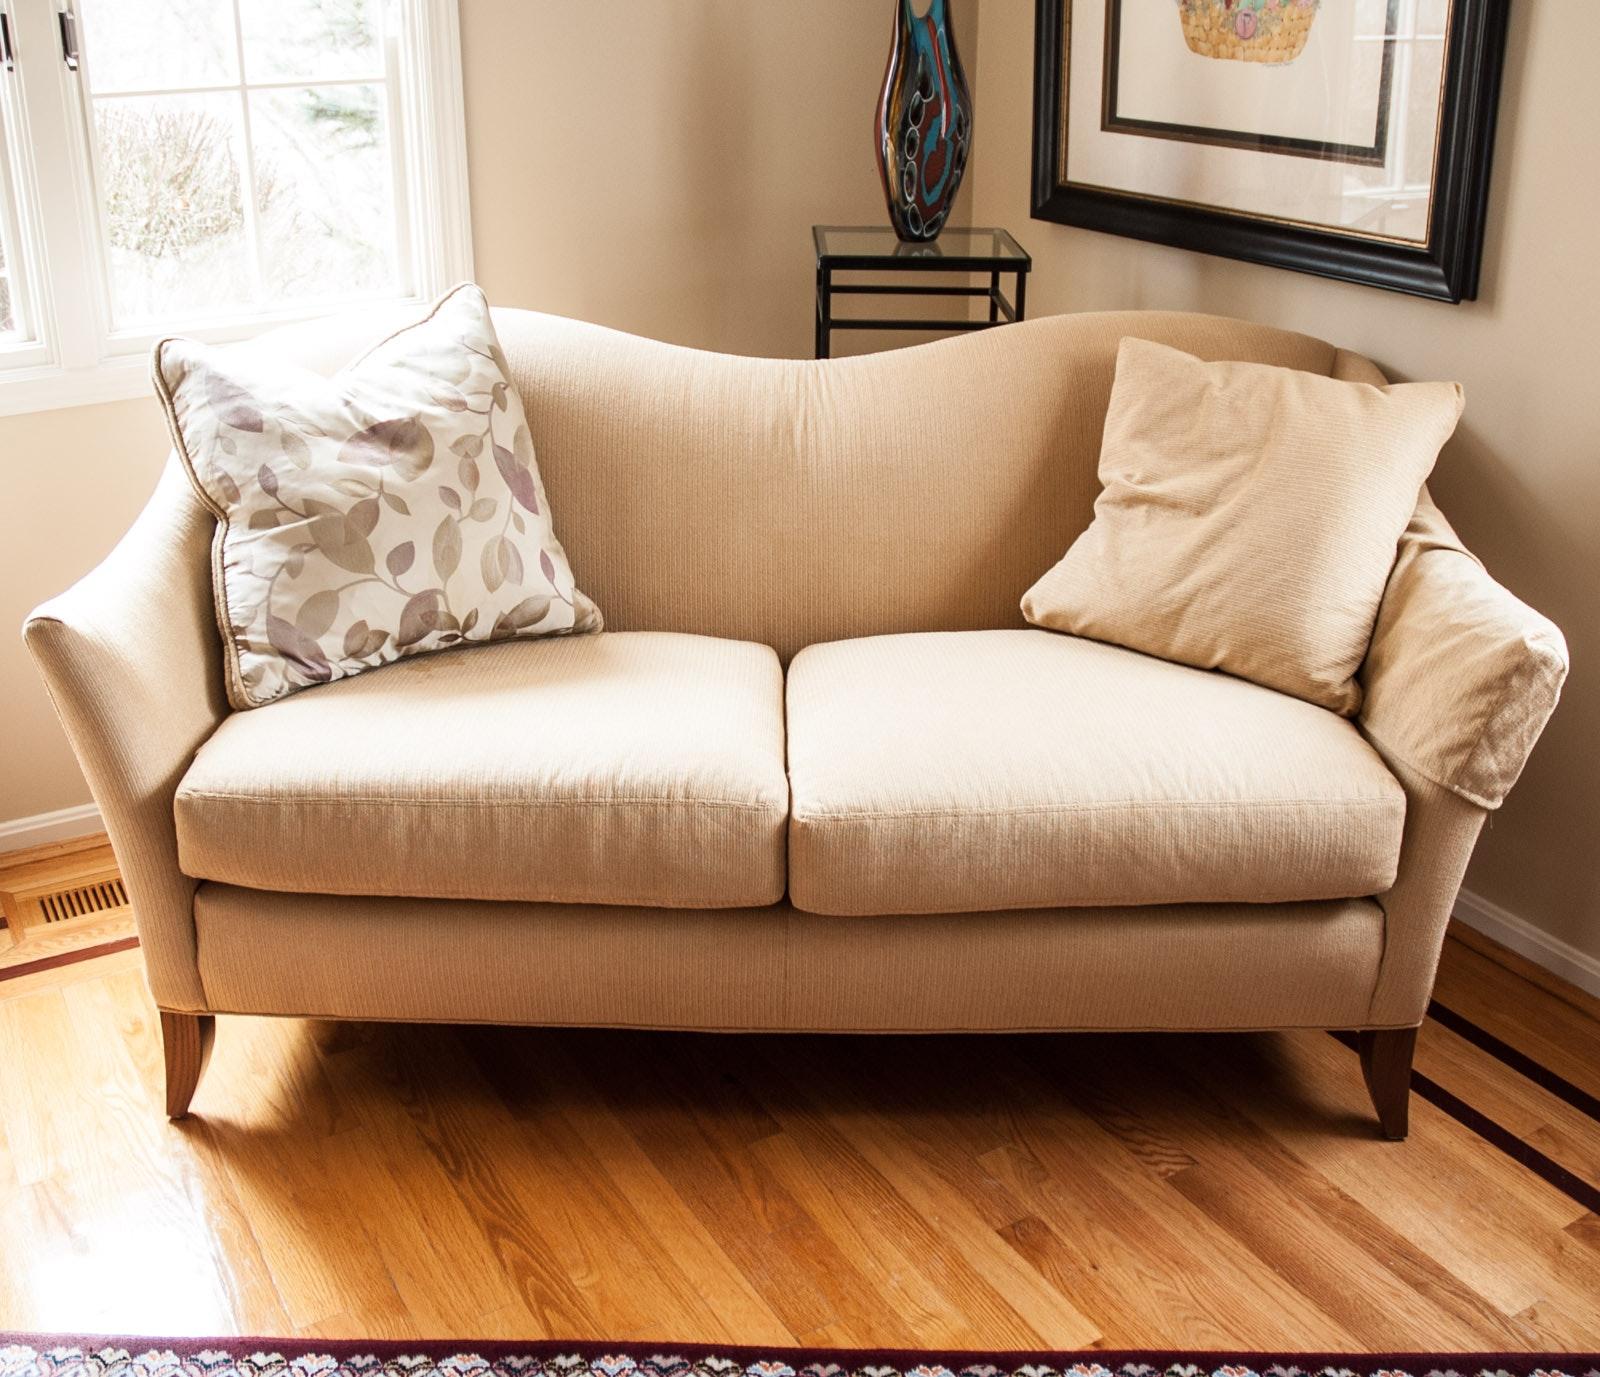 Settee by Vanguard Furniture